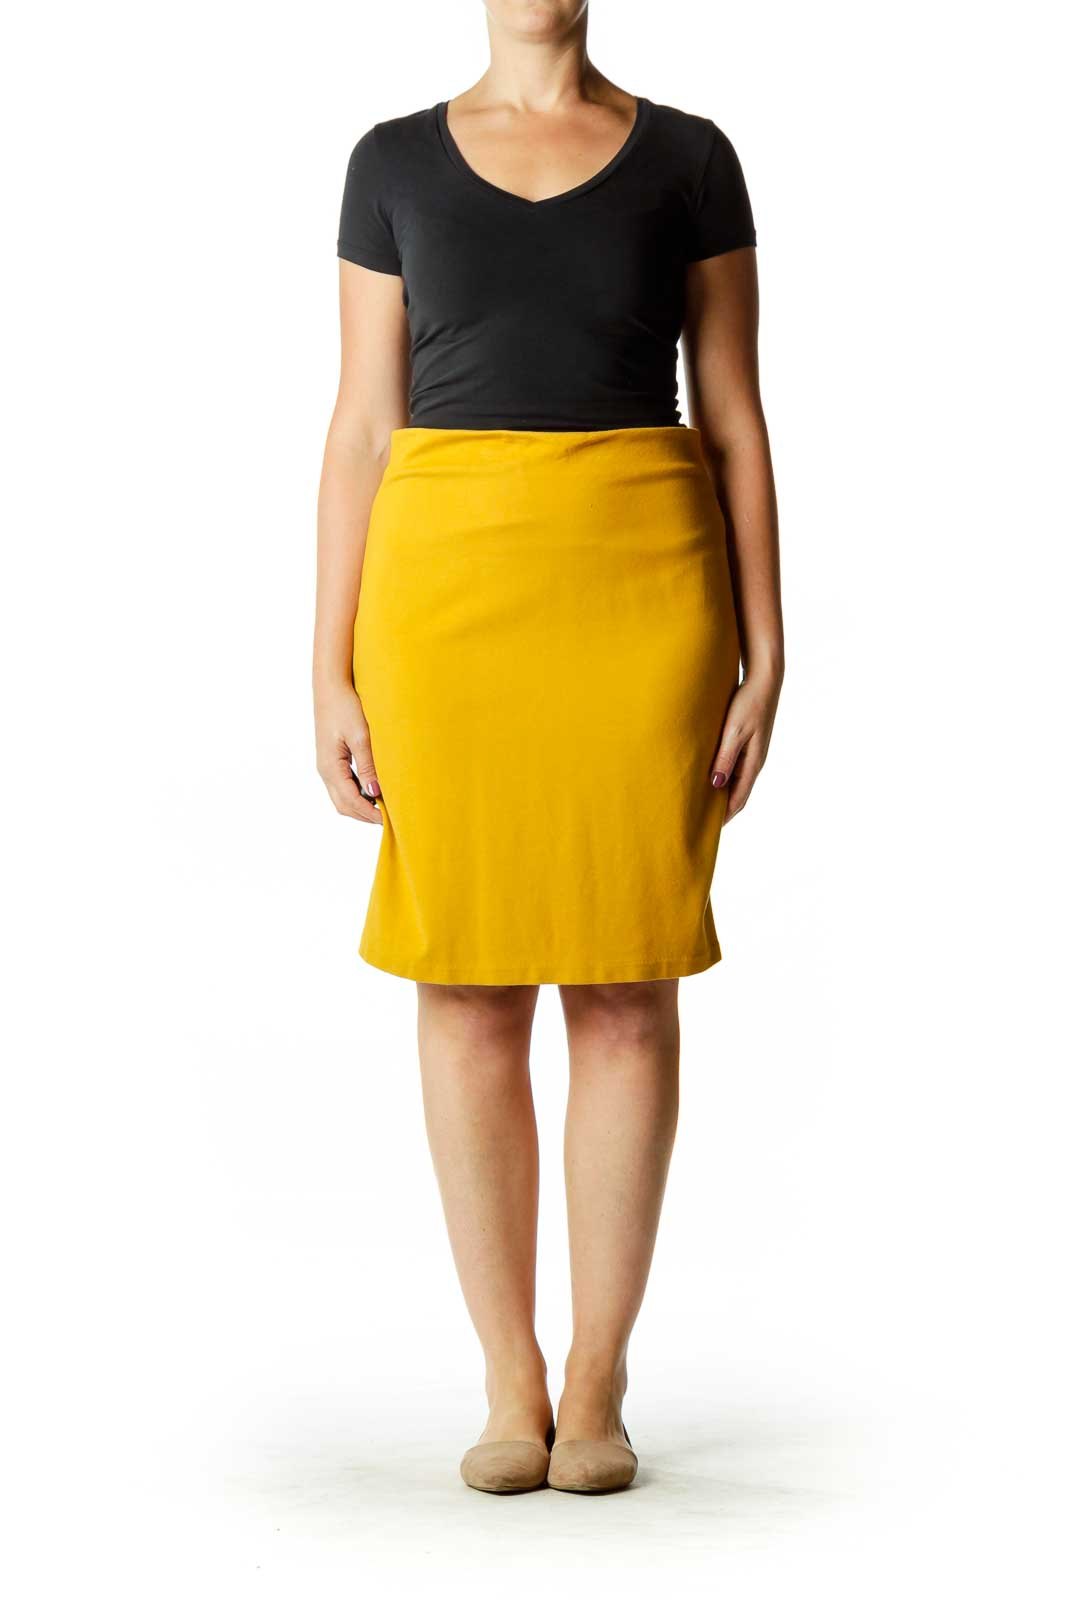 Mustard Yellow Pencil Skirt